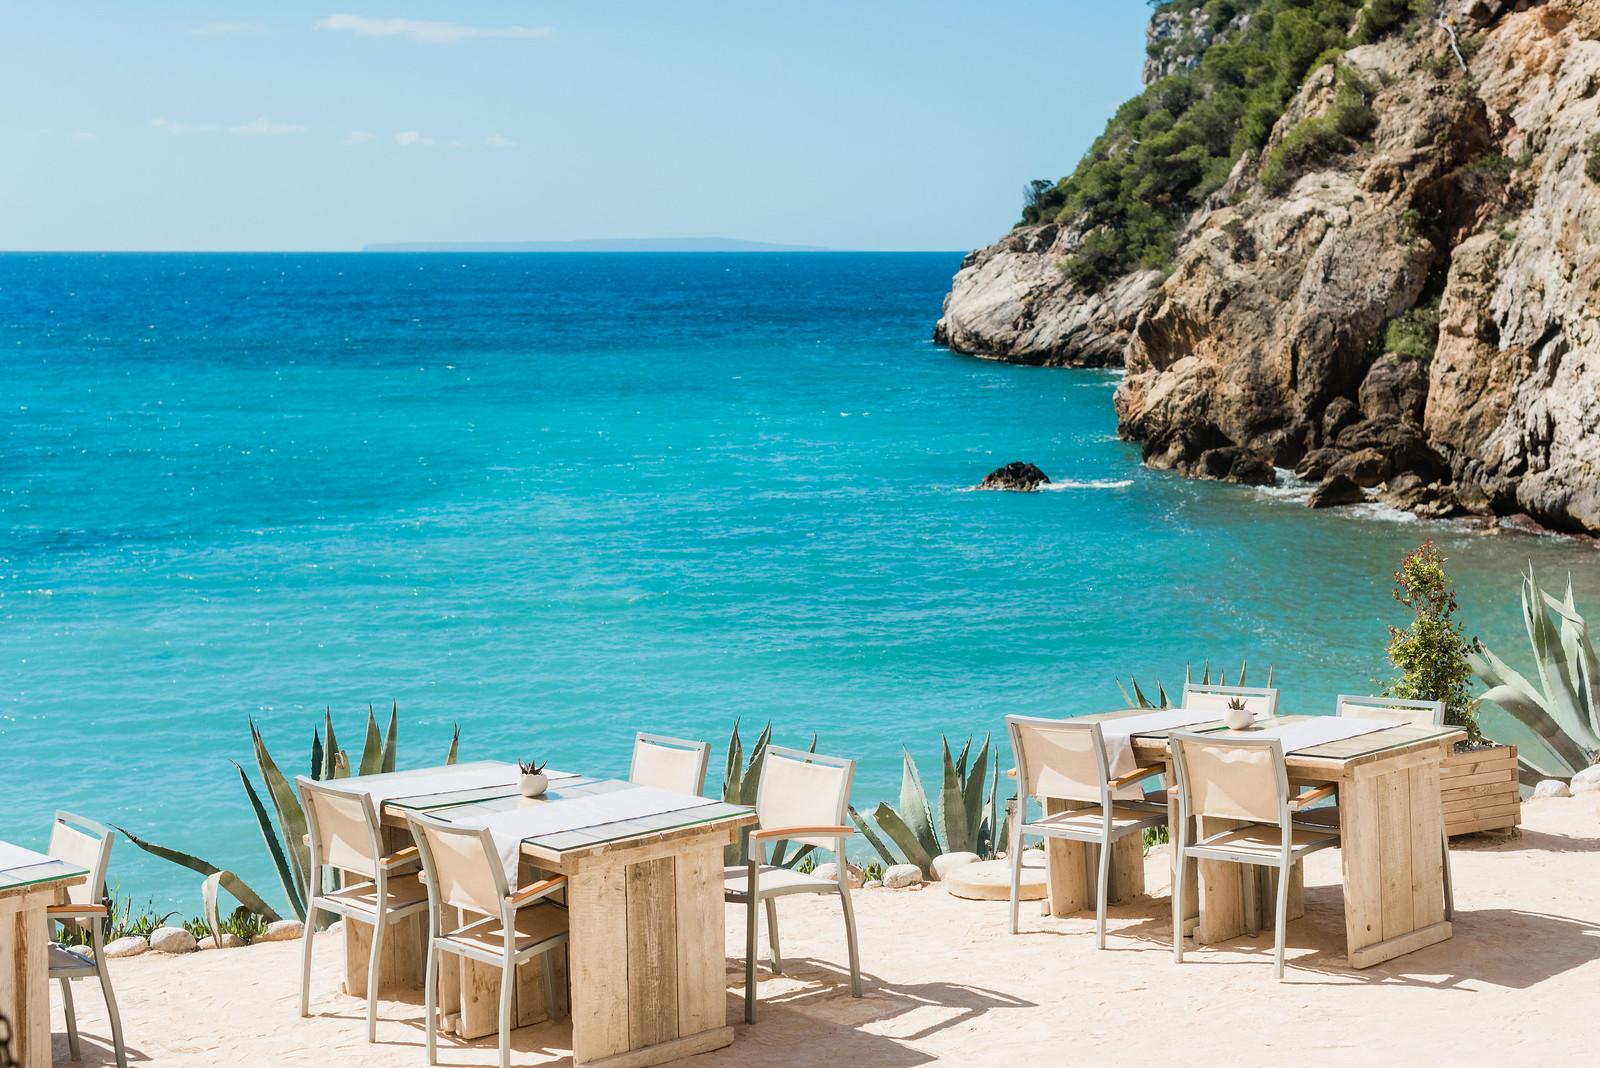 https://www.white-ibiza.com/wp-content/uploads/2020/02/ibiza-beach-restaurant-amante-ibiza-2019-01-1.jpg